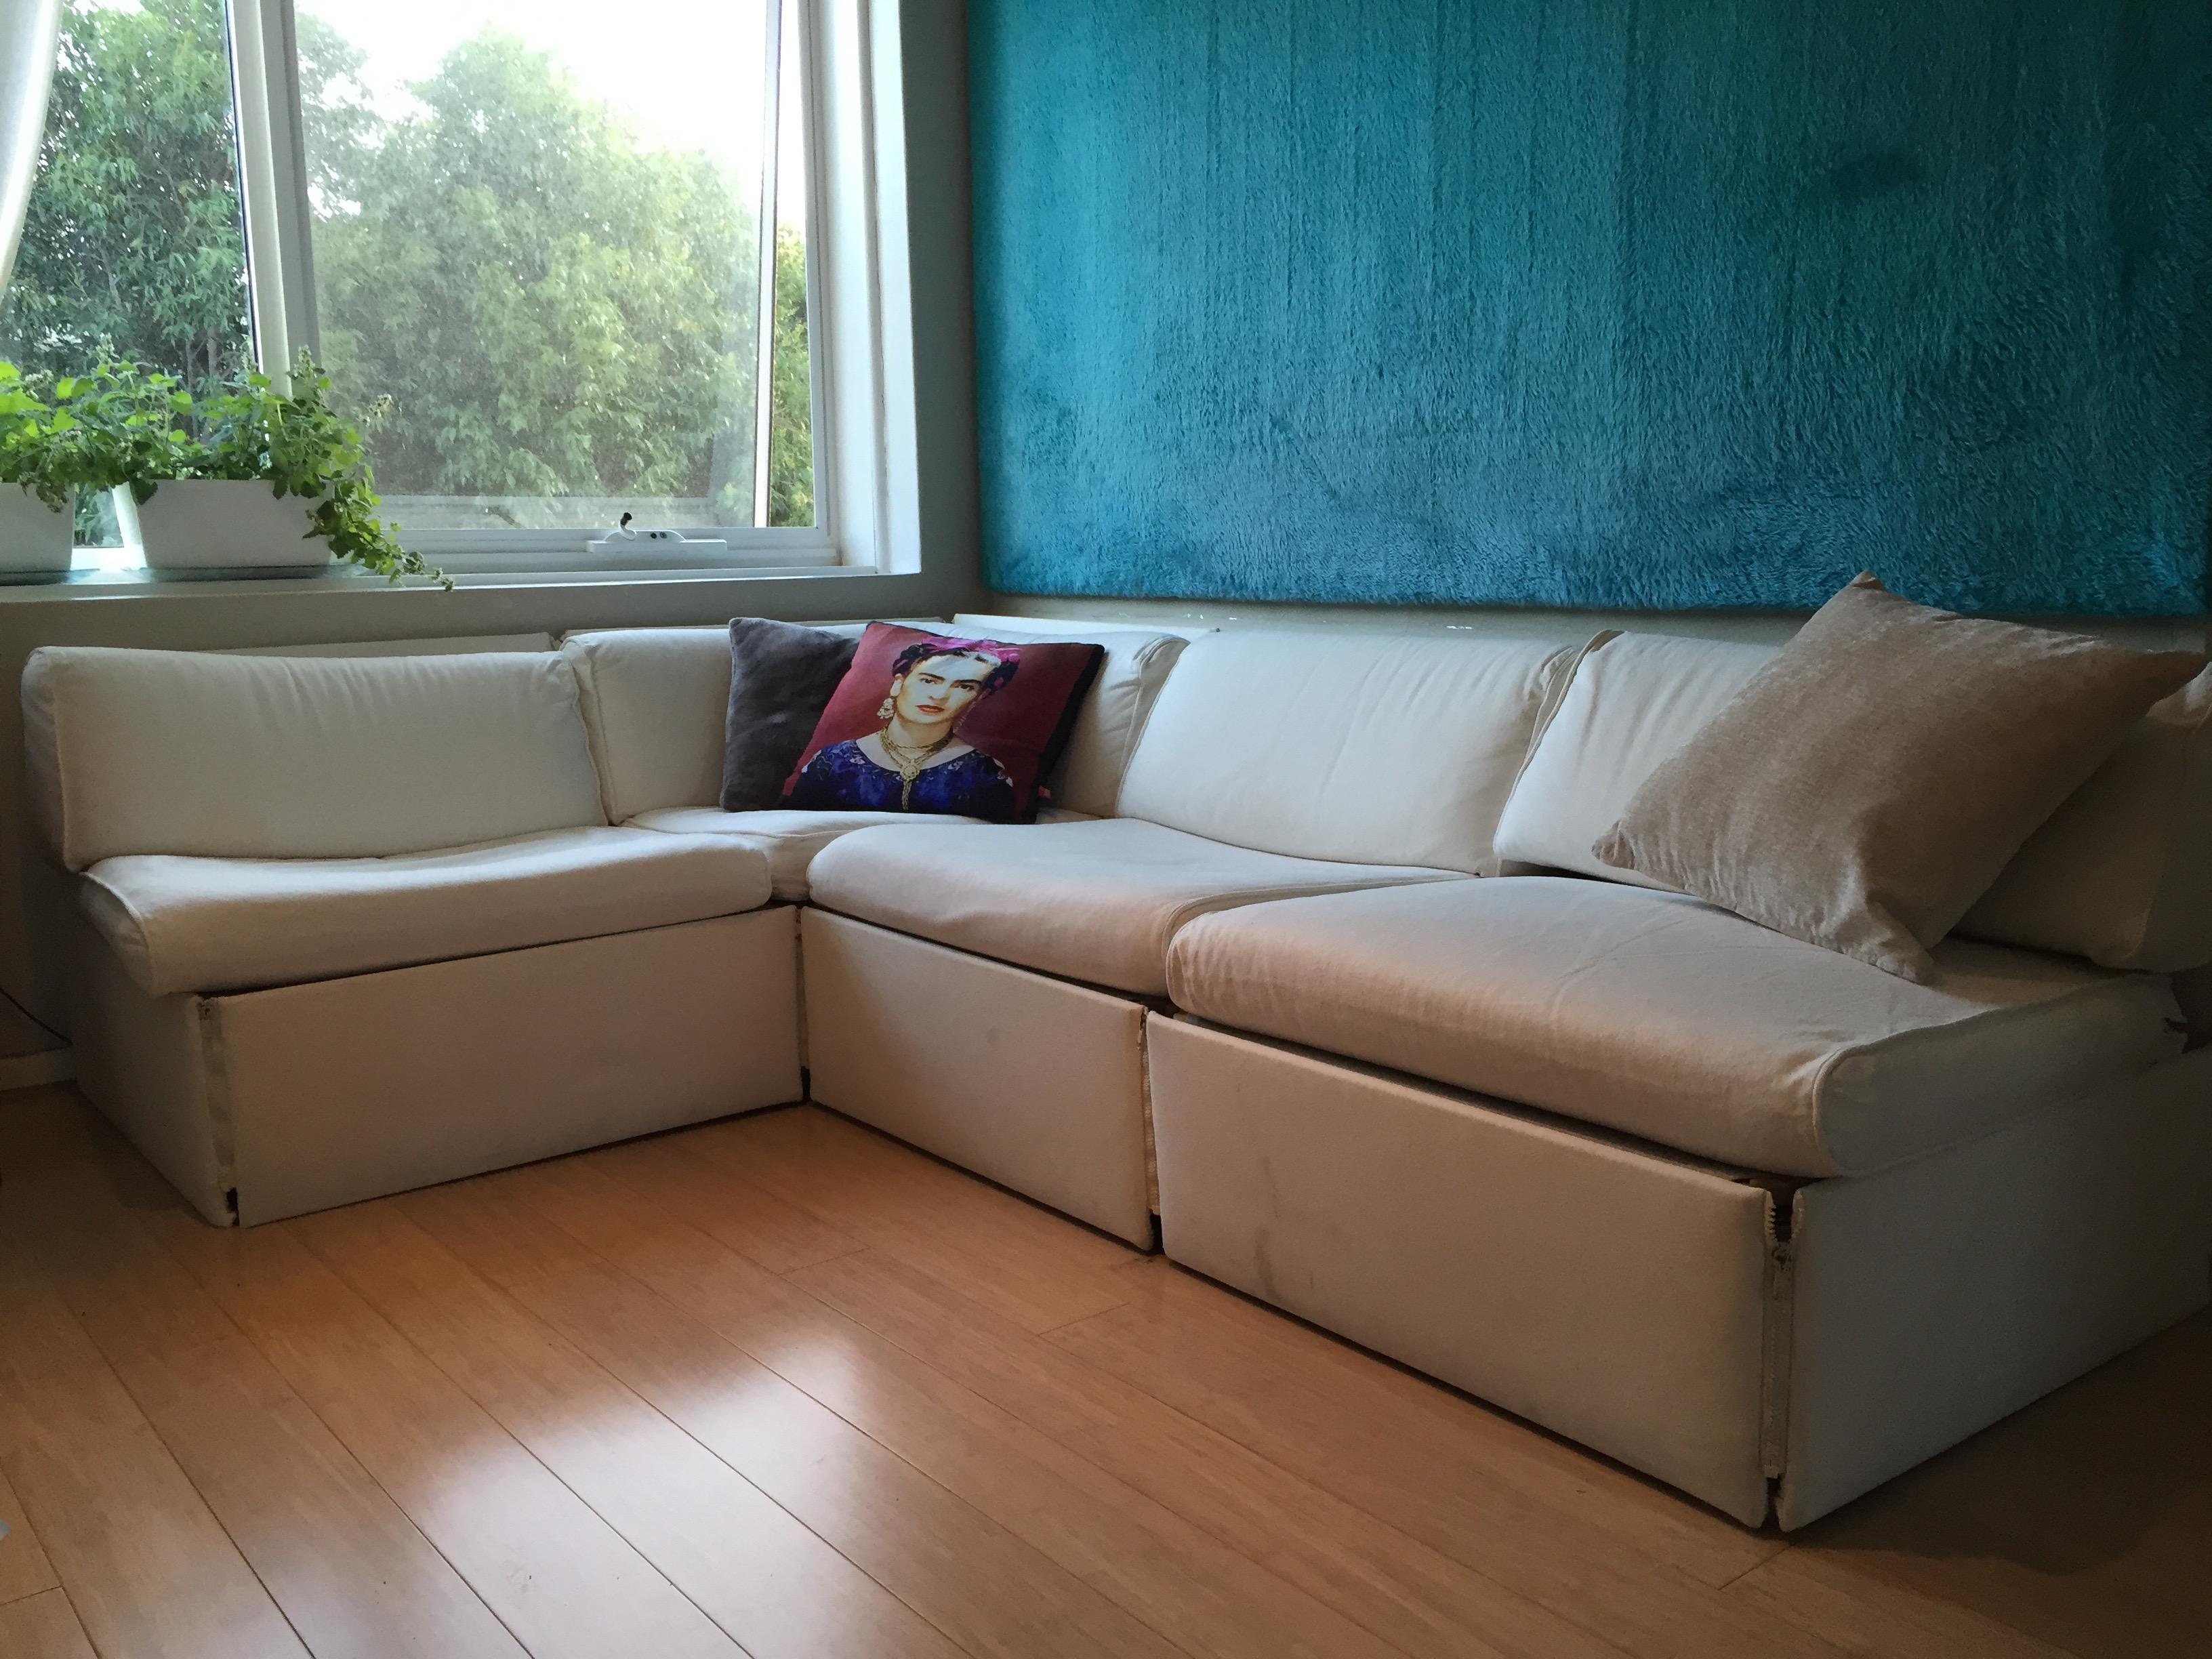 IKEA modular sofa still strong after 238 years